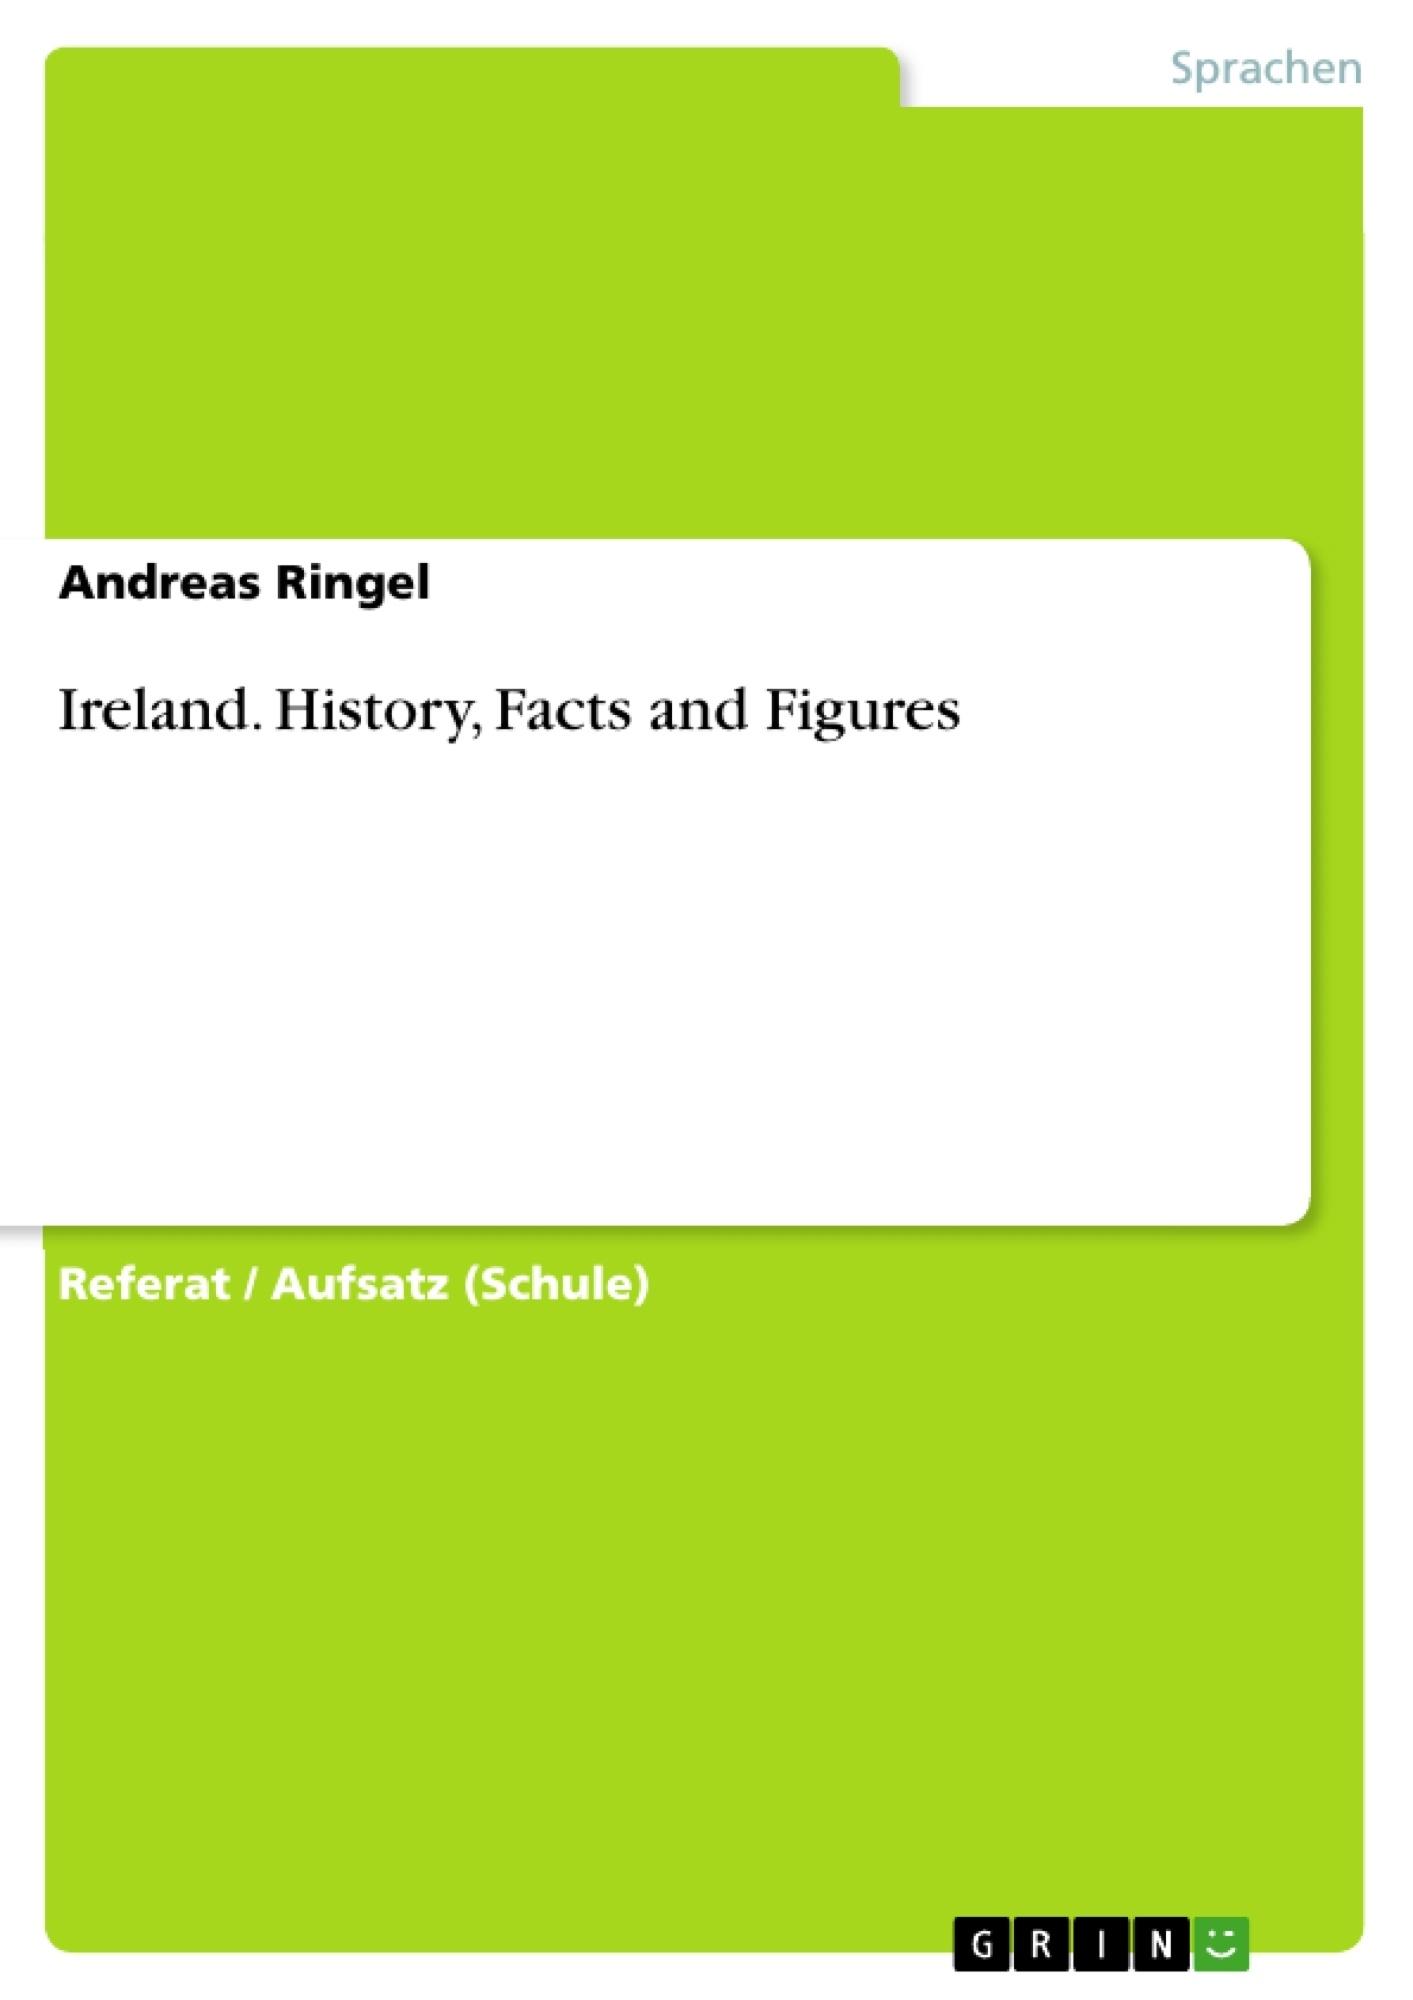 Ireland. History, Facts and Figures | Masterarbeit, Hausarbeit ...